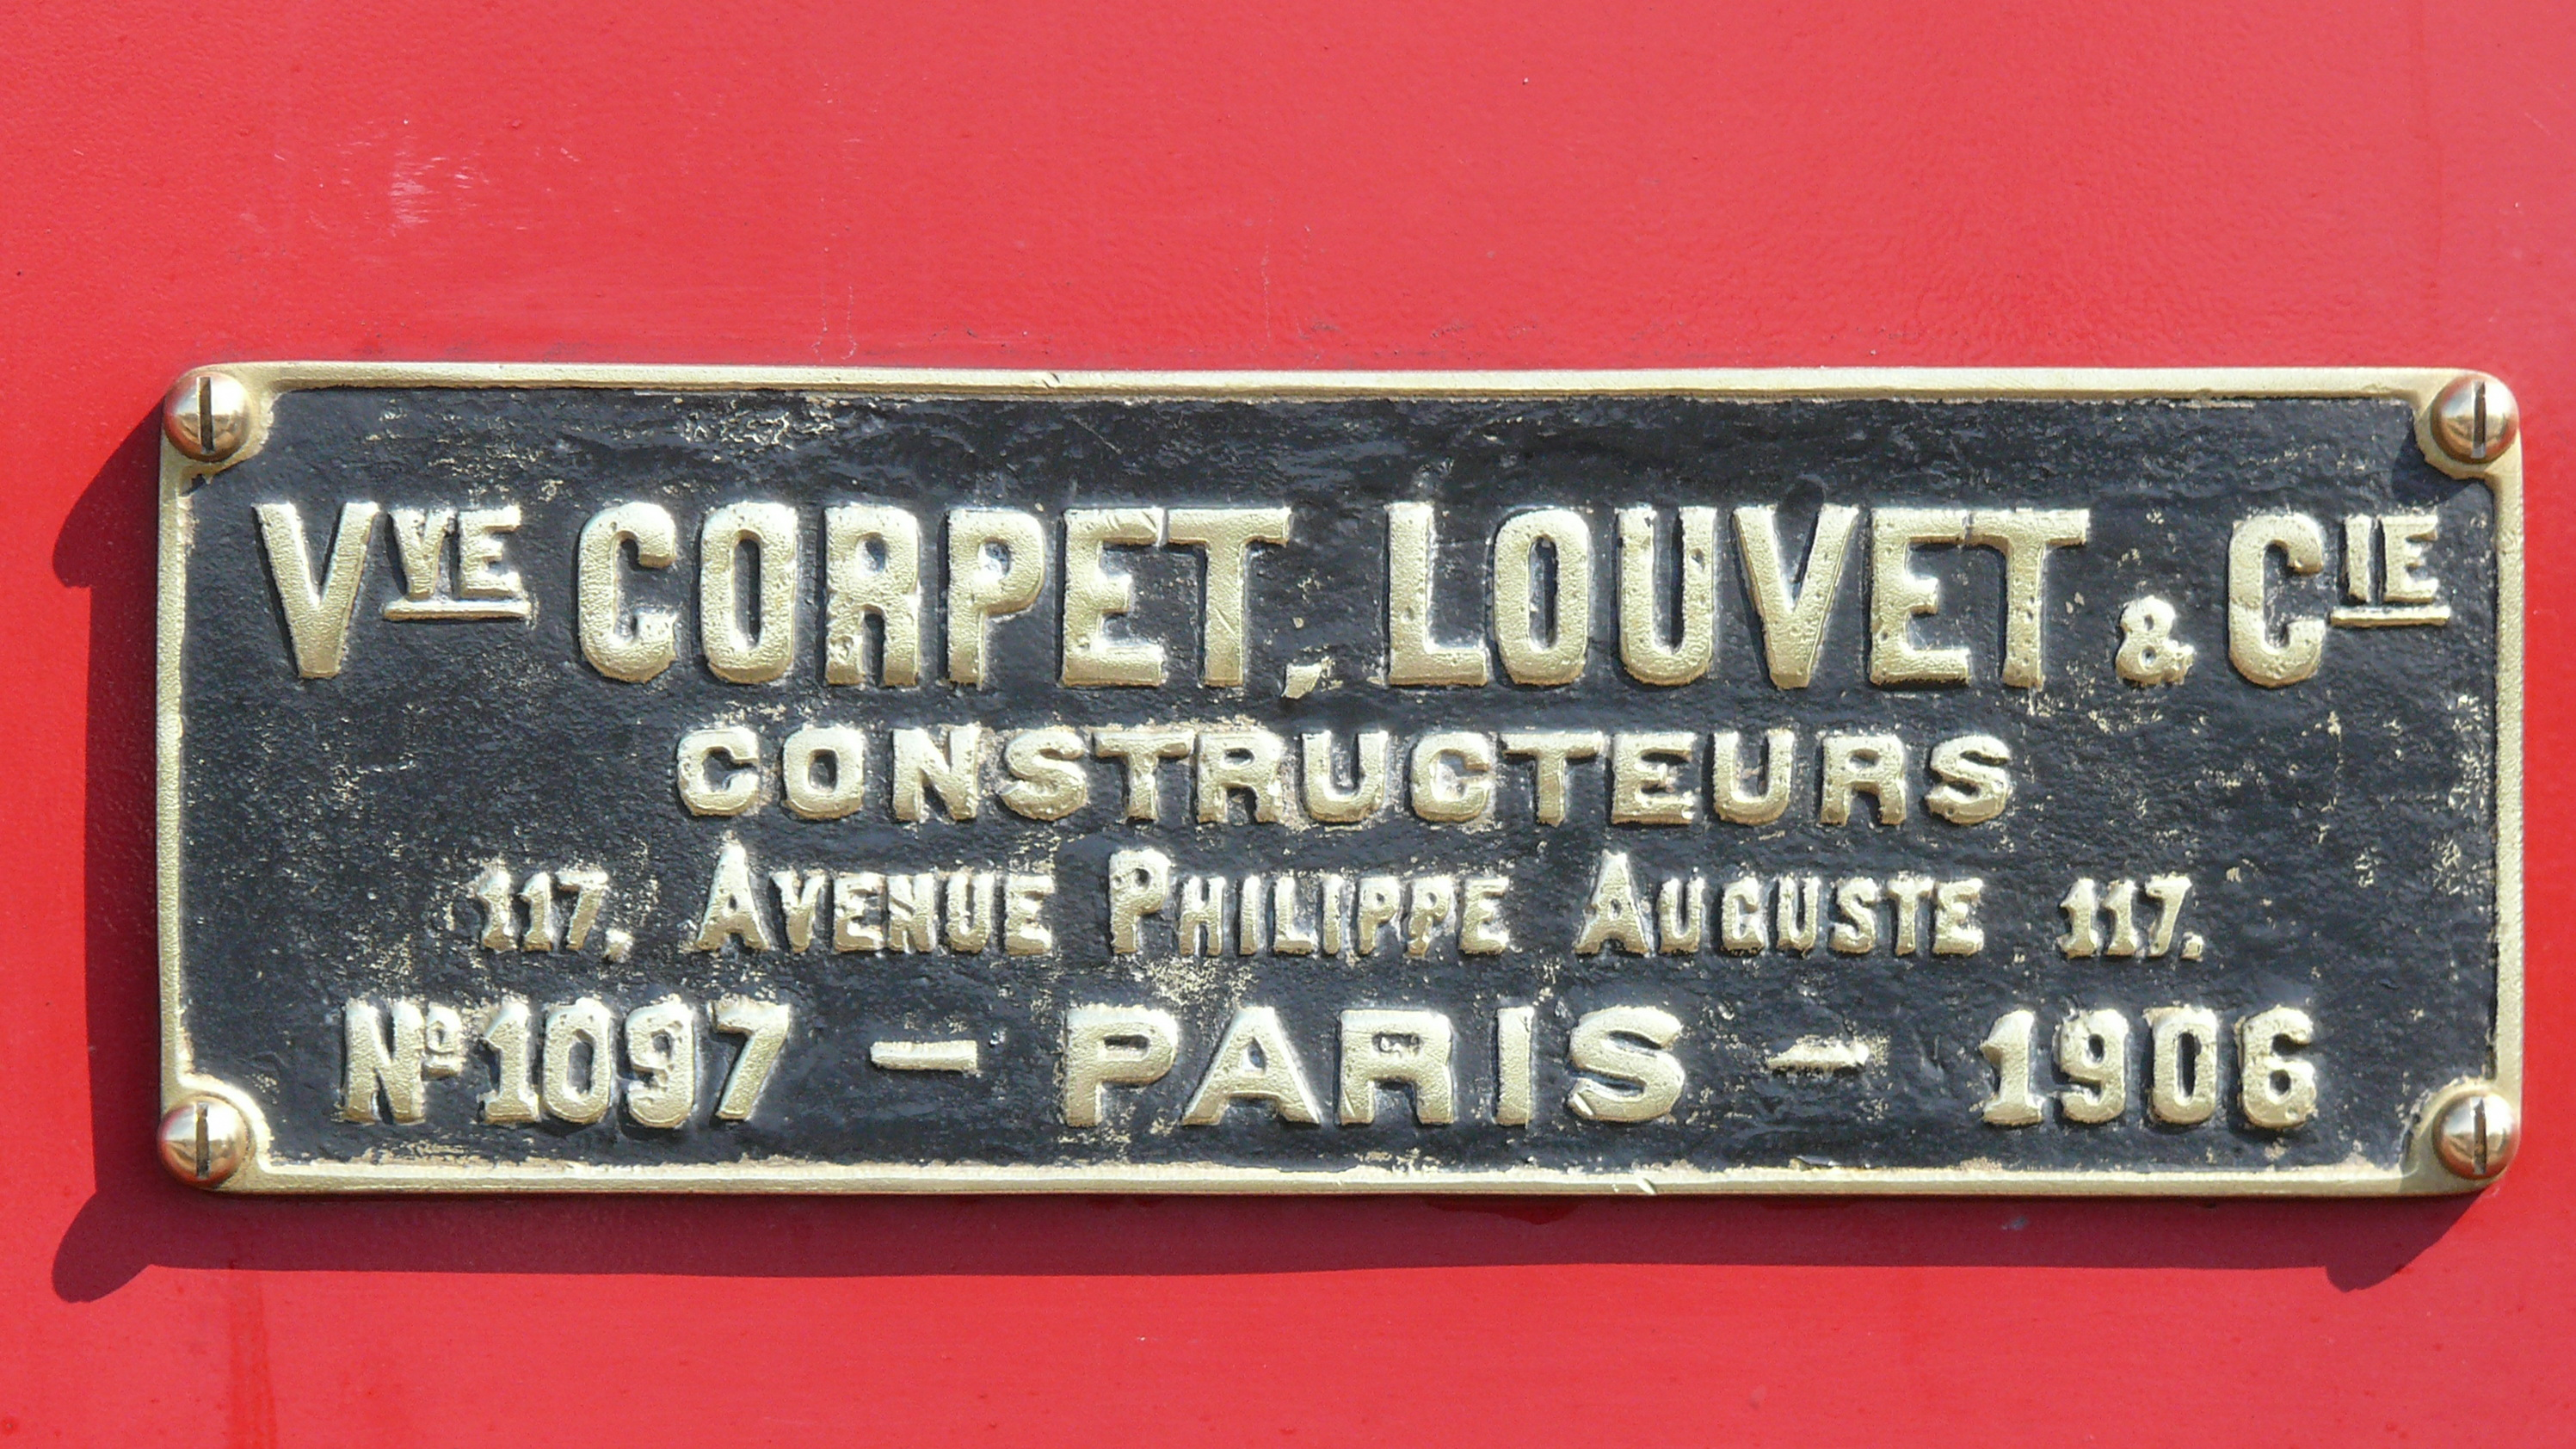 Corpet-Louvet_N%C2%B01097_CDA_N%C2%B01_P